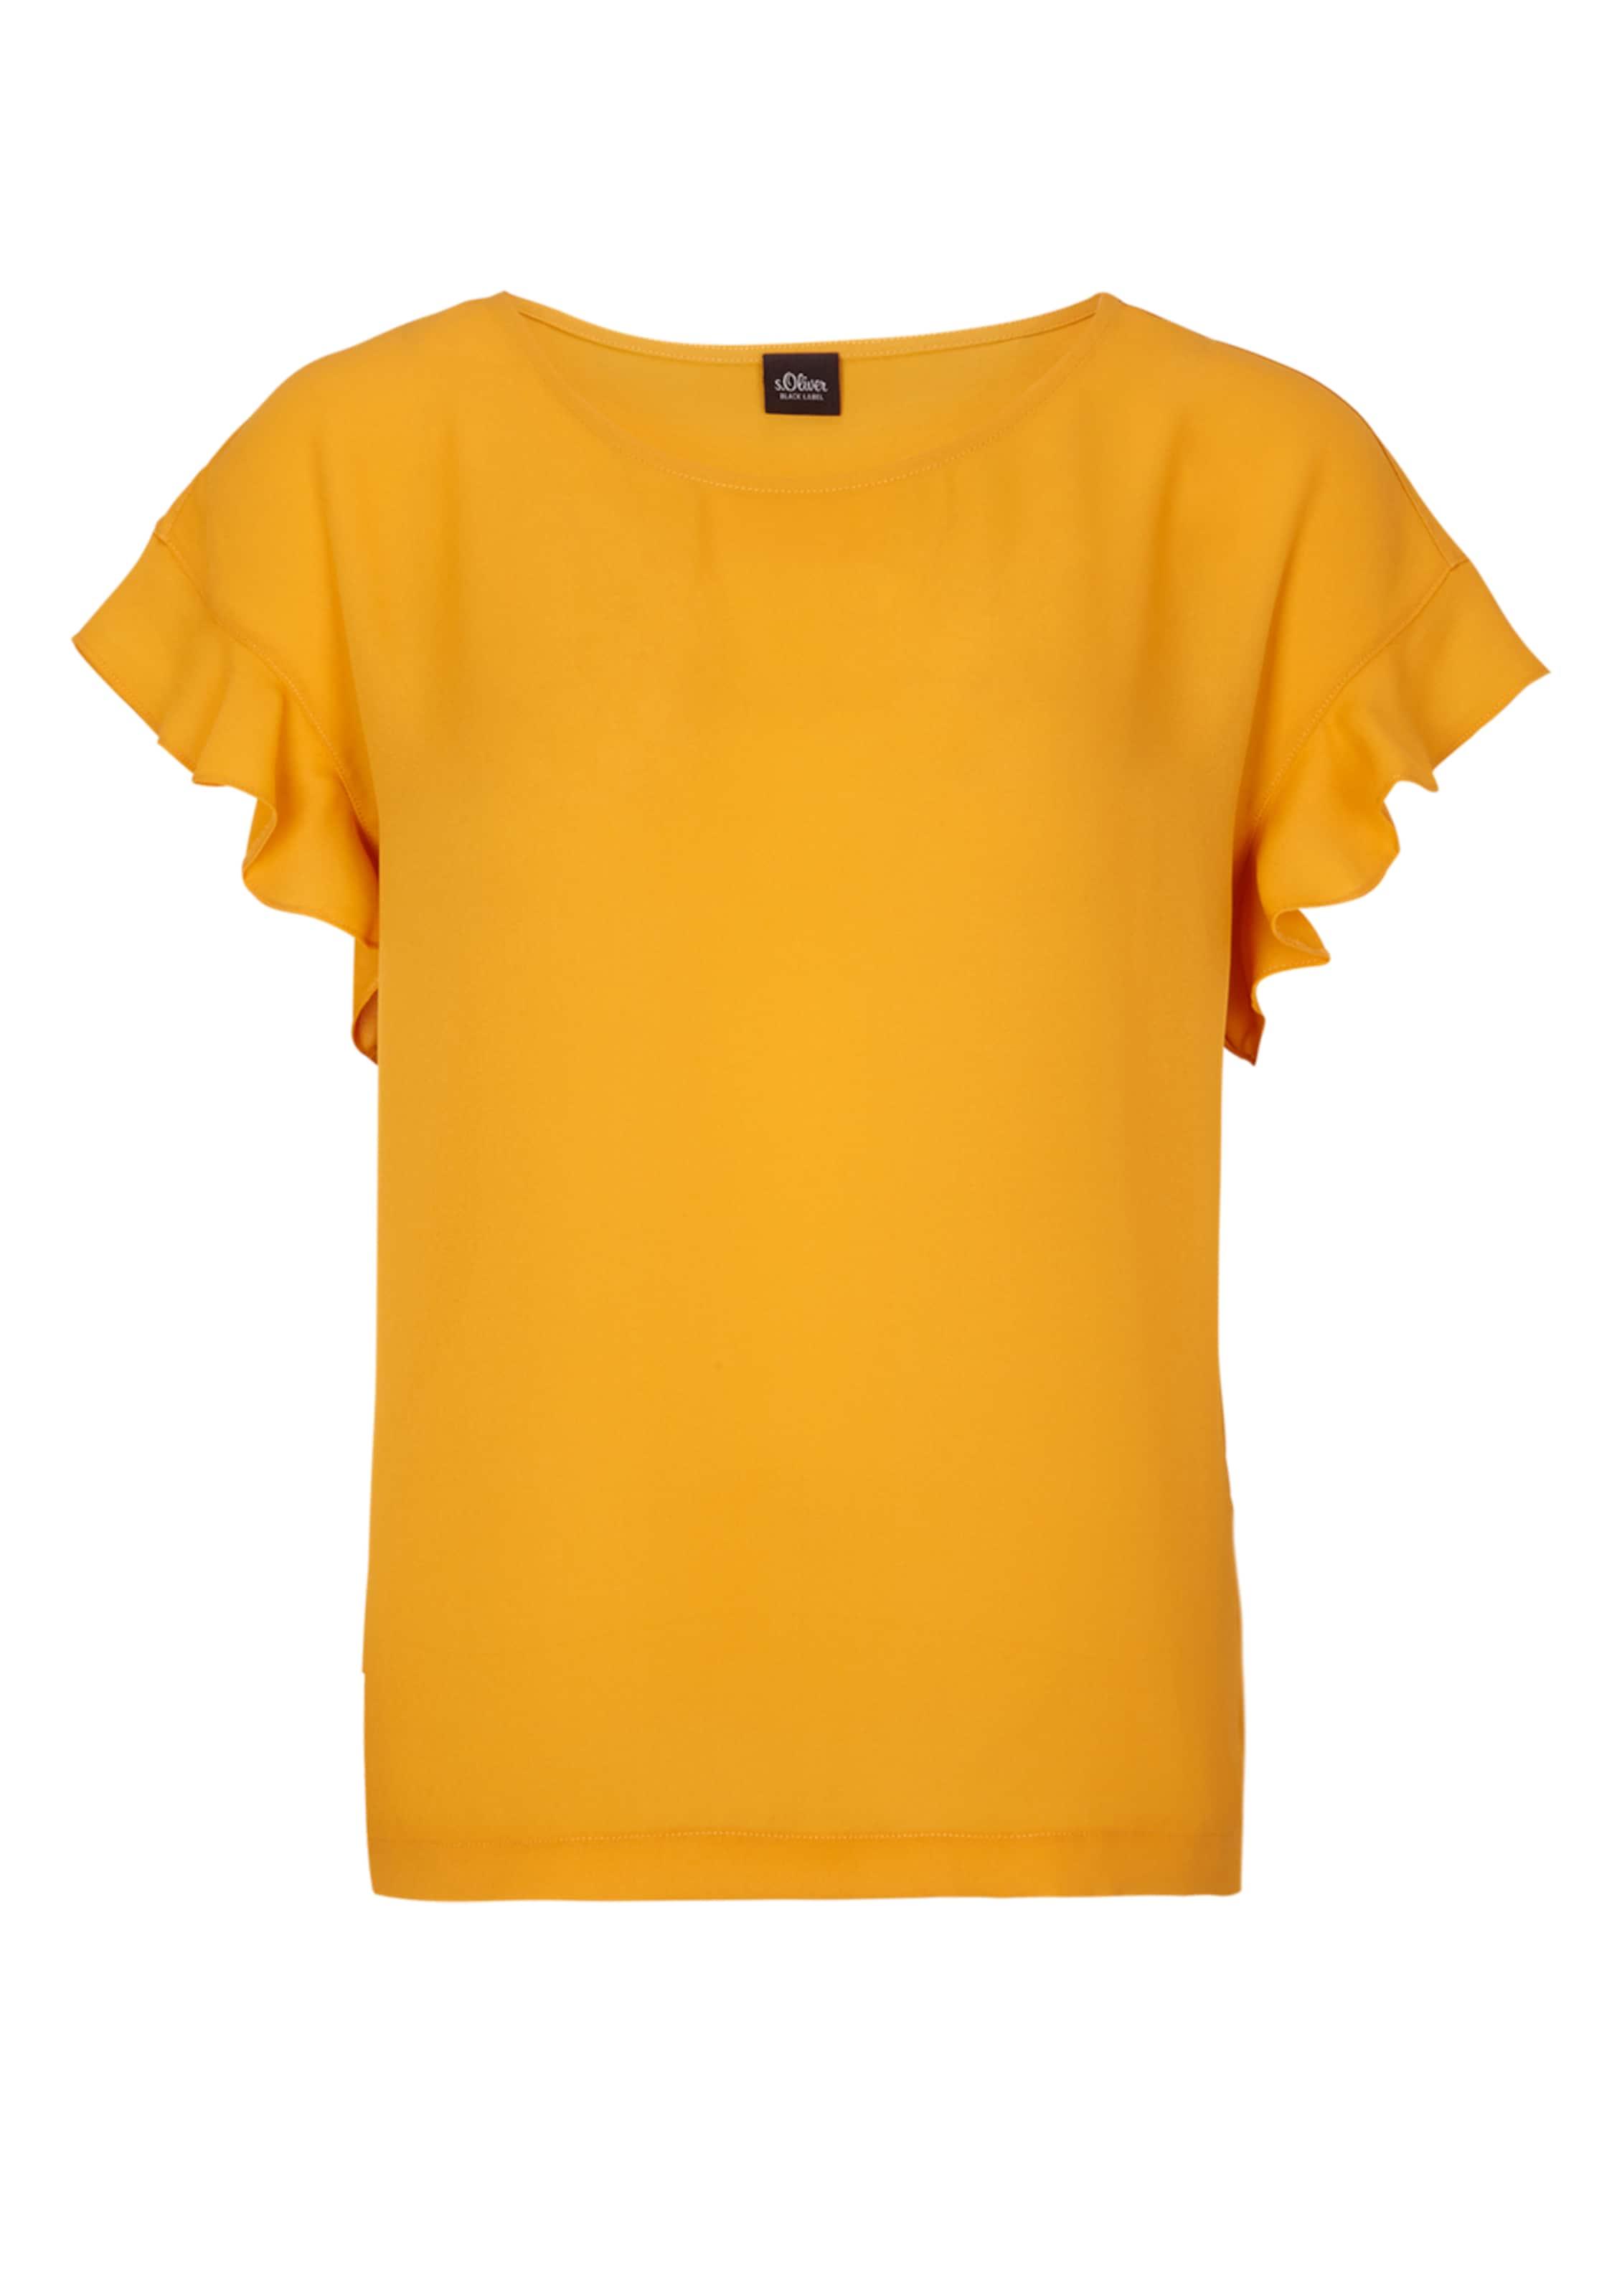 Mit Blusenshirt S Volants Label Gelb Black In oliver 76vYbfgy